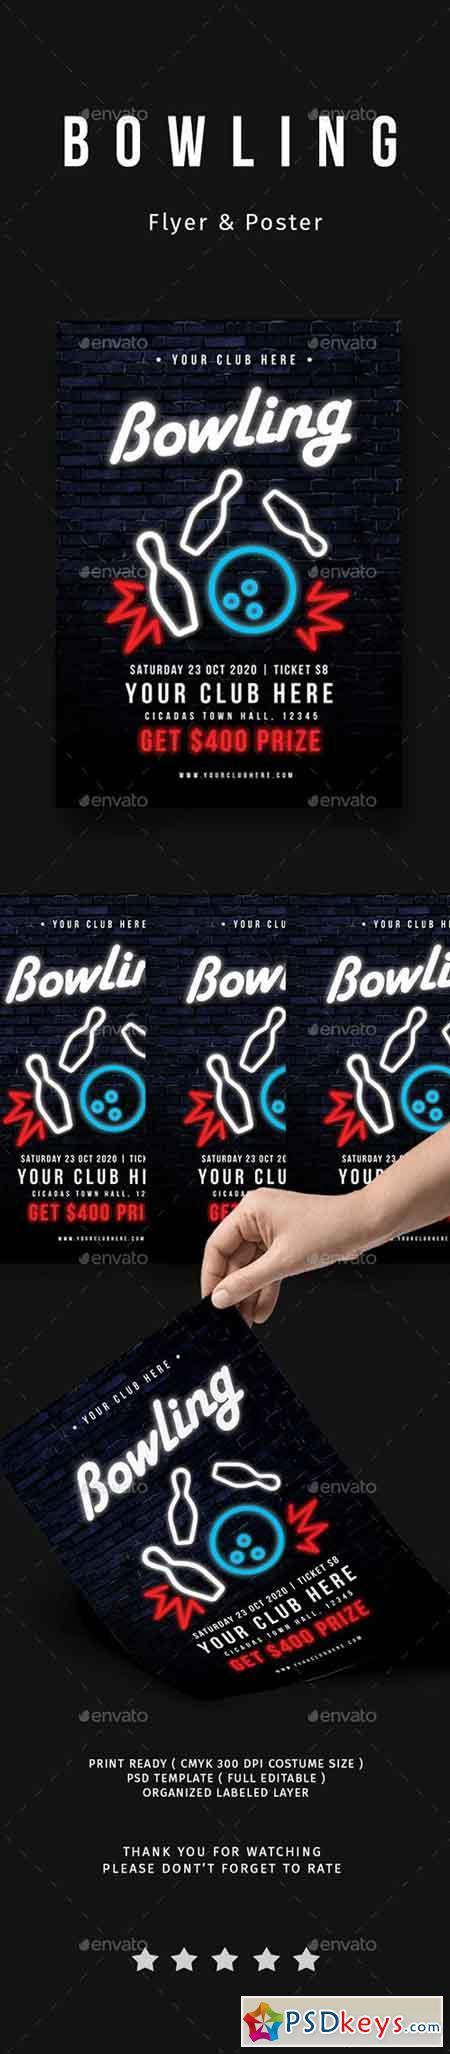 Bowling Tournament Flyer 20715836